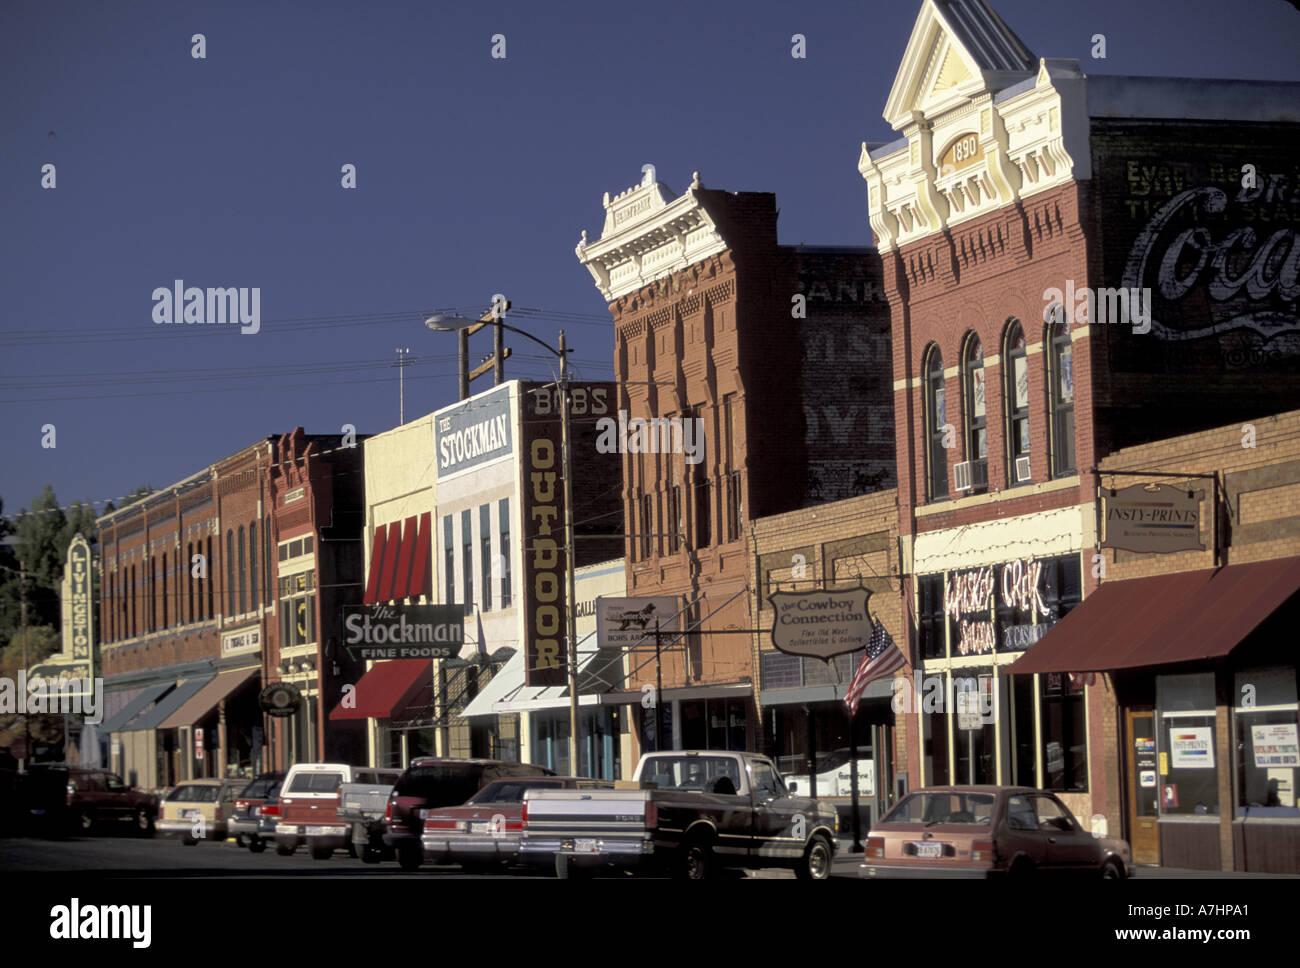 NA, USA, Montana, Livingston Western storefronts on Main Street; cowboy town; sunset - Stock Image